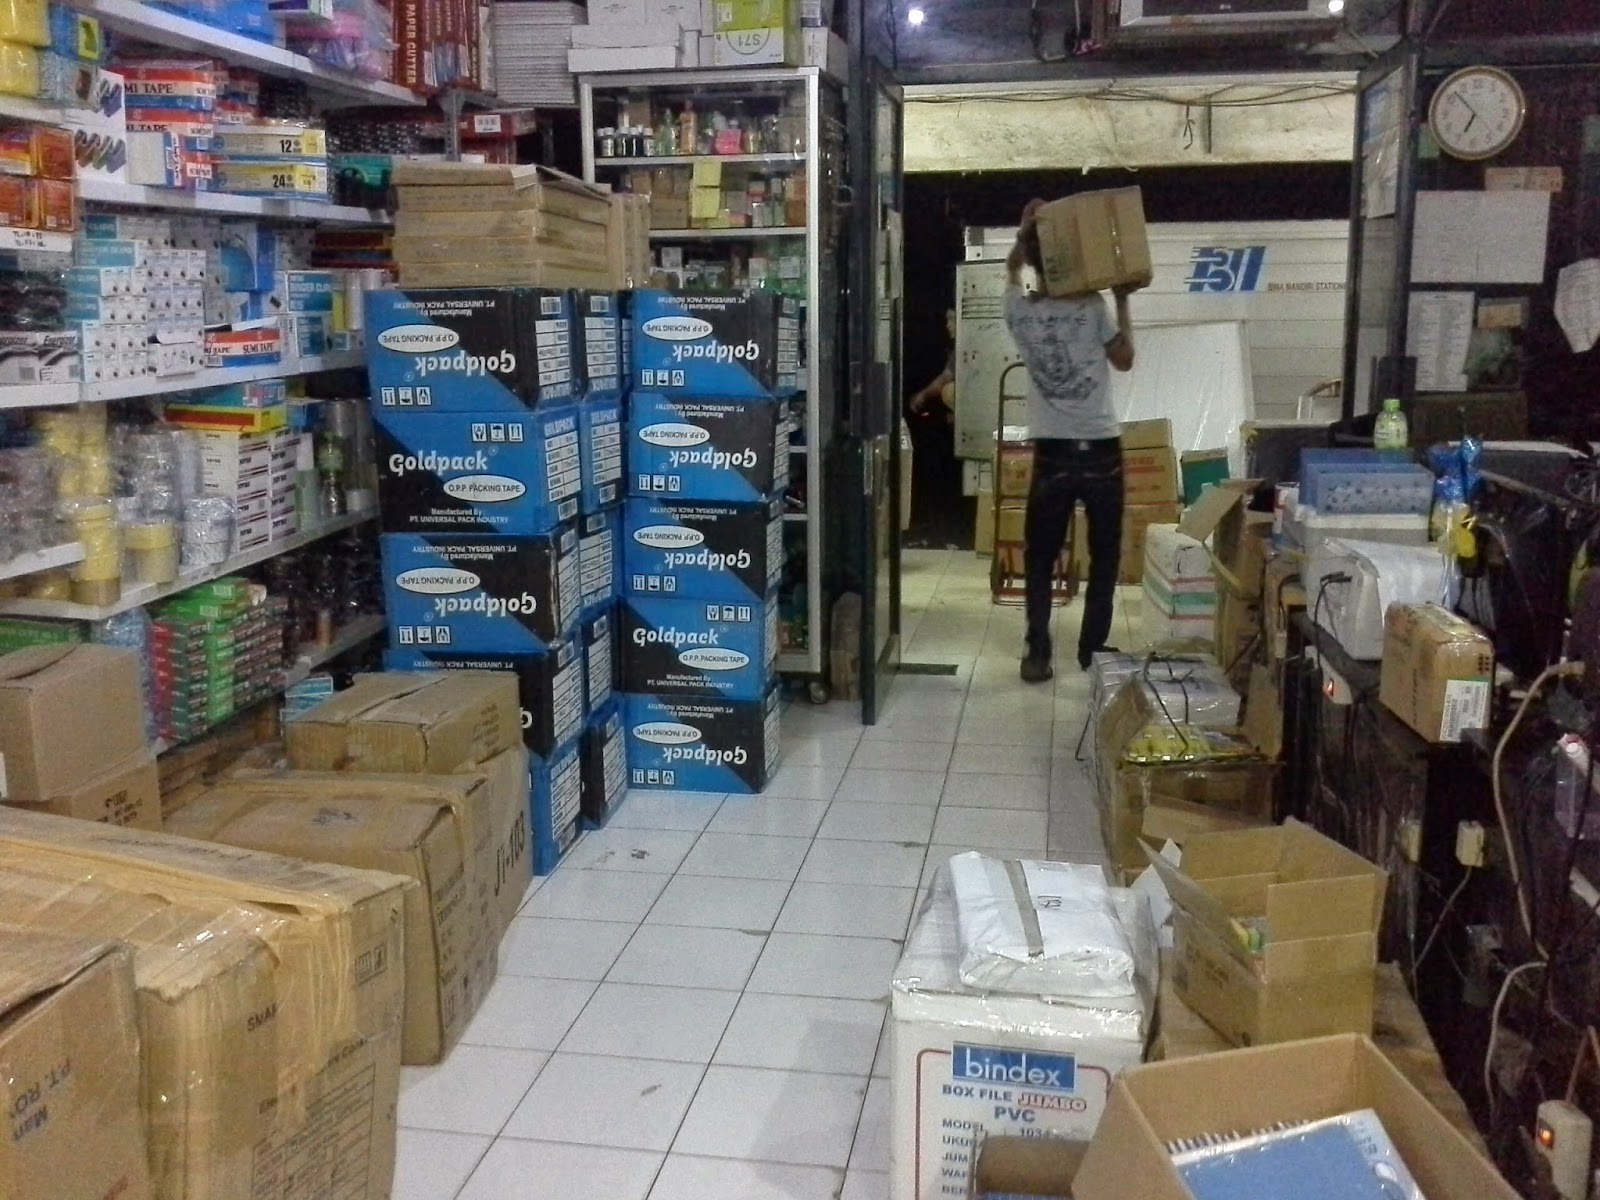 www.hargaalattuliskantor.com toko stationery sekolah murah